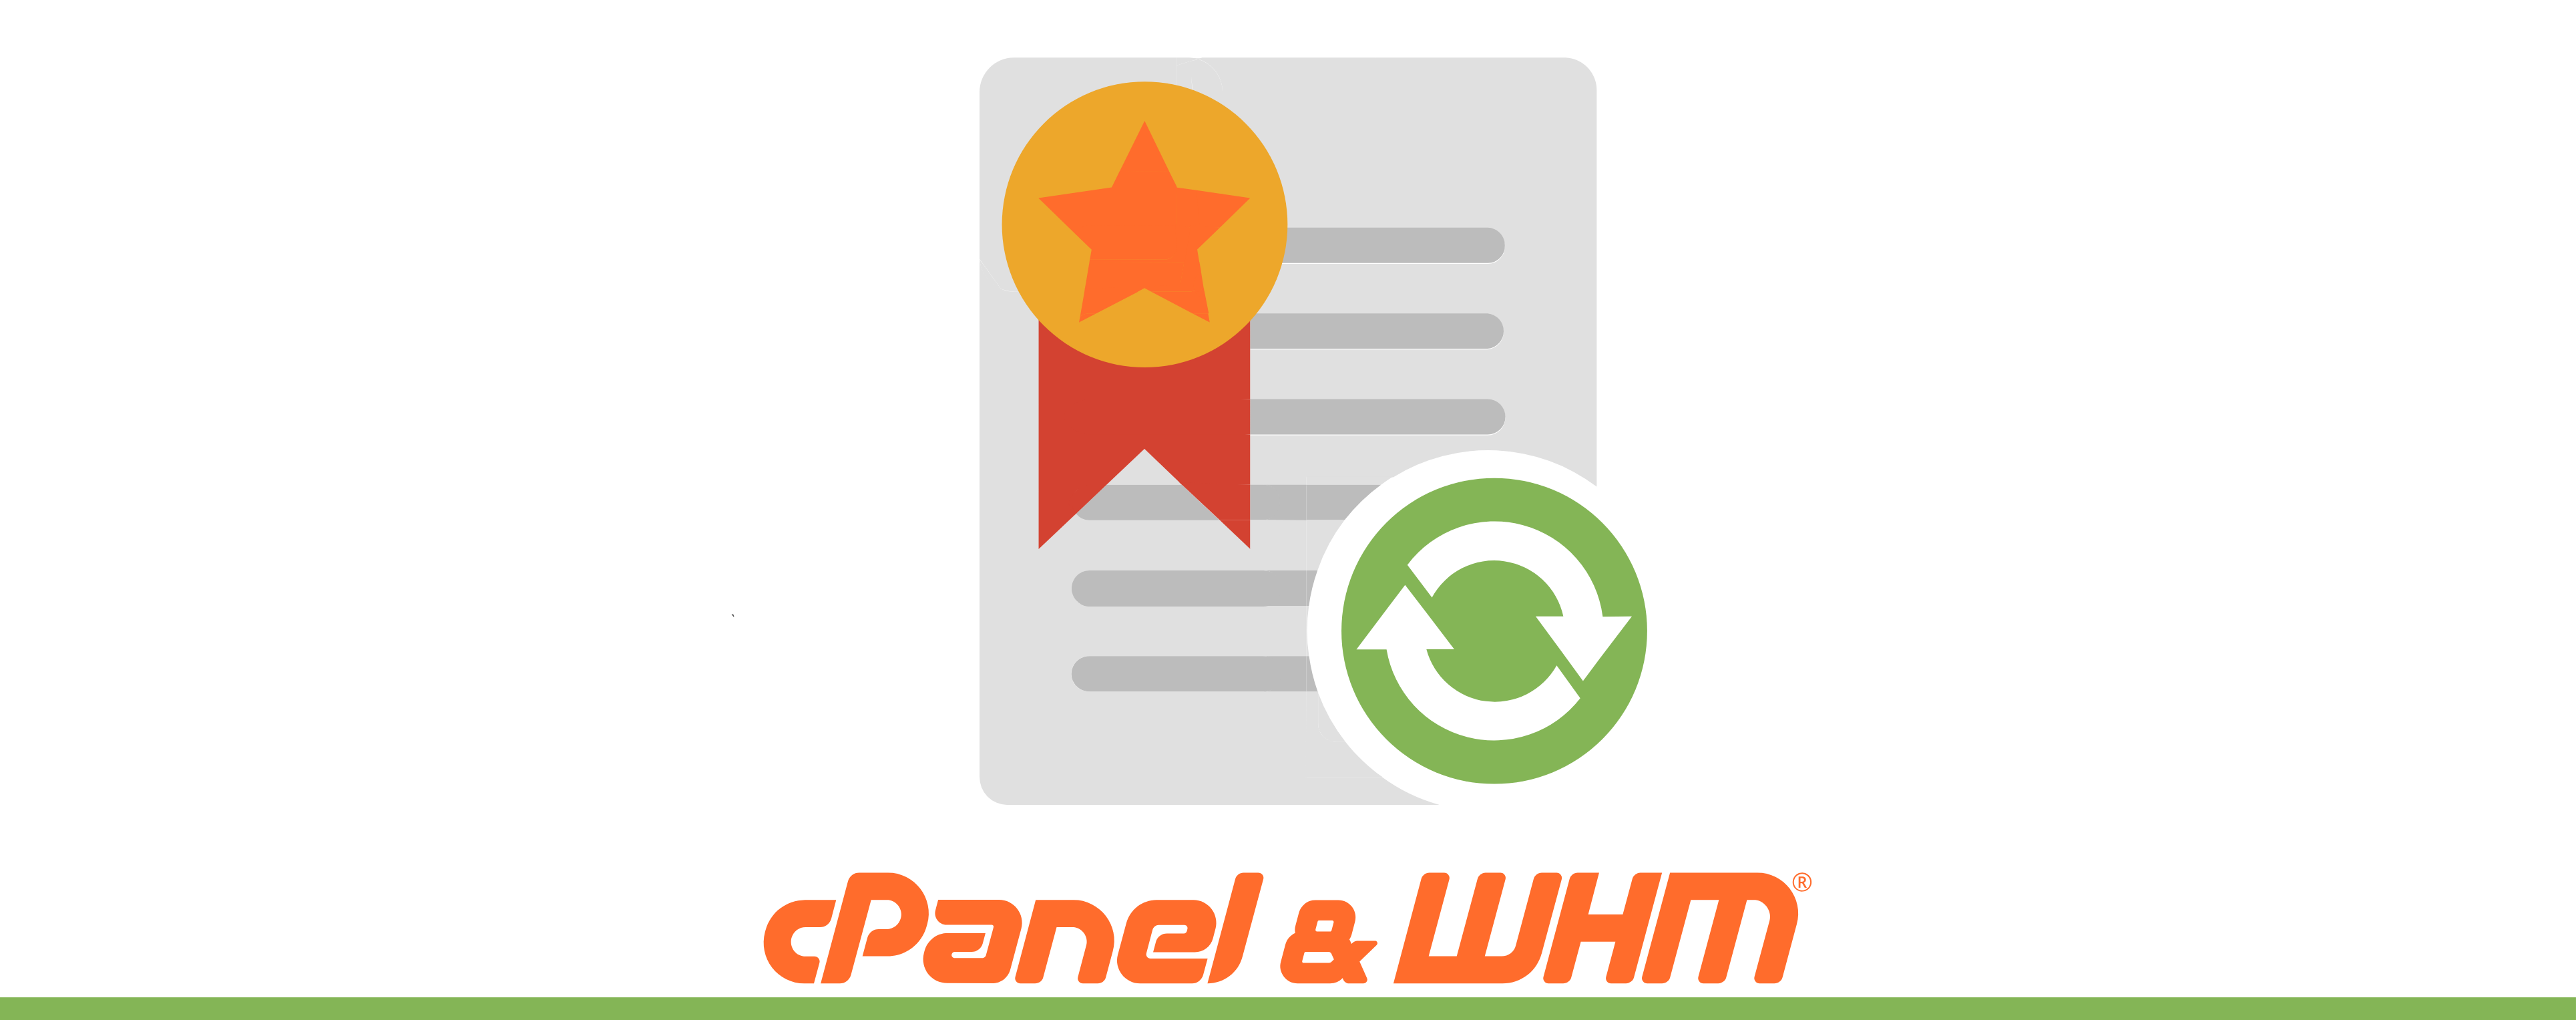 Let's Talk AutoSSL- The Updates! | cPanel Blog